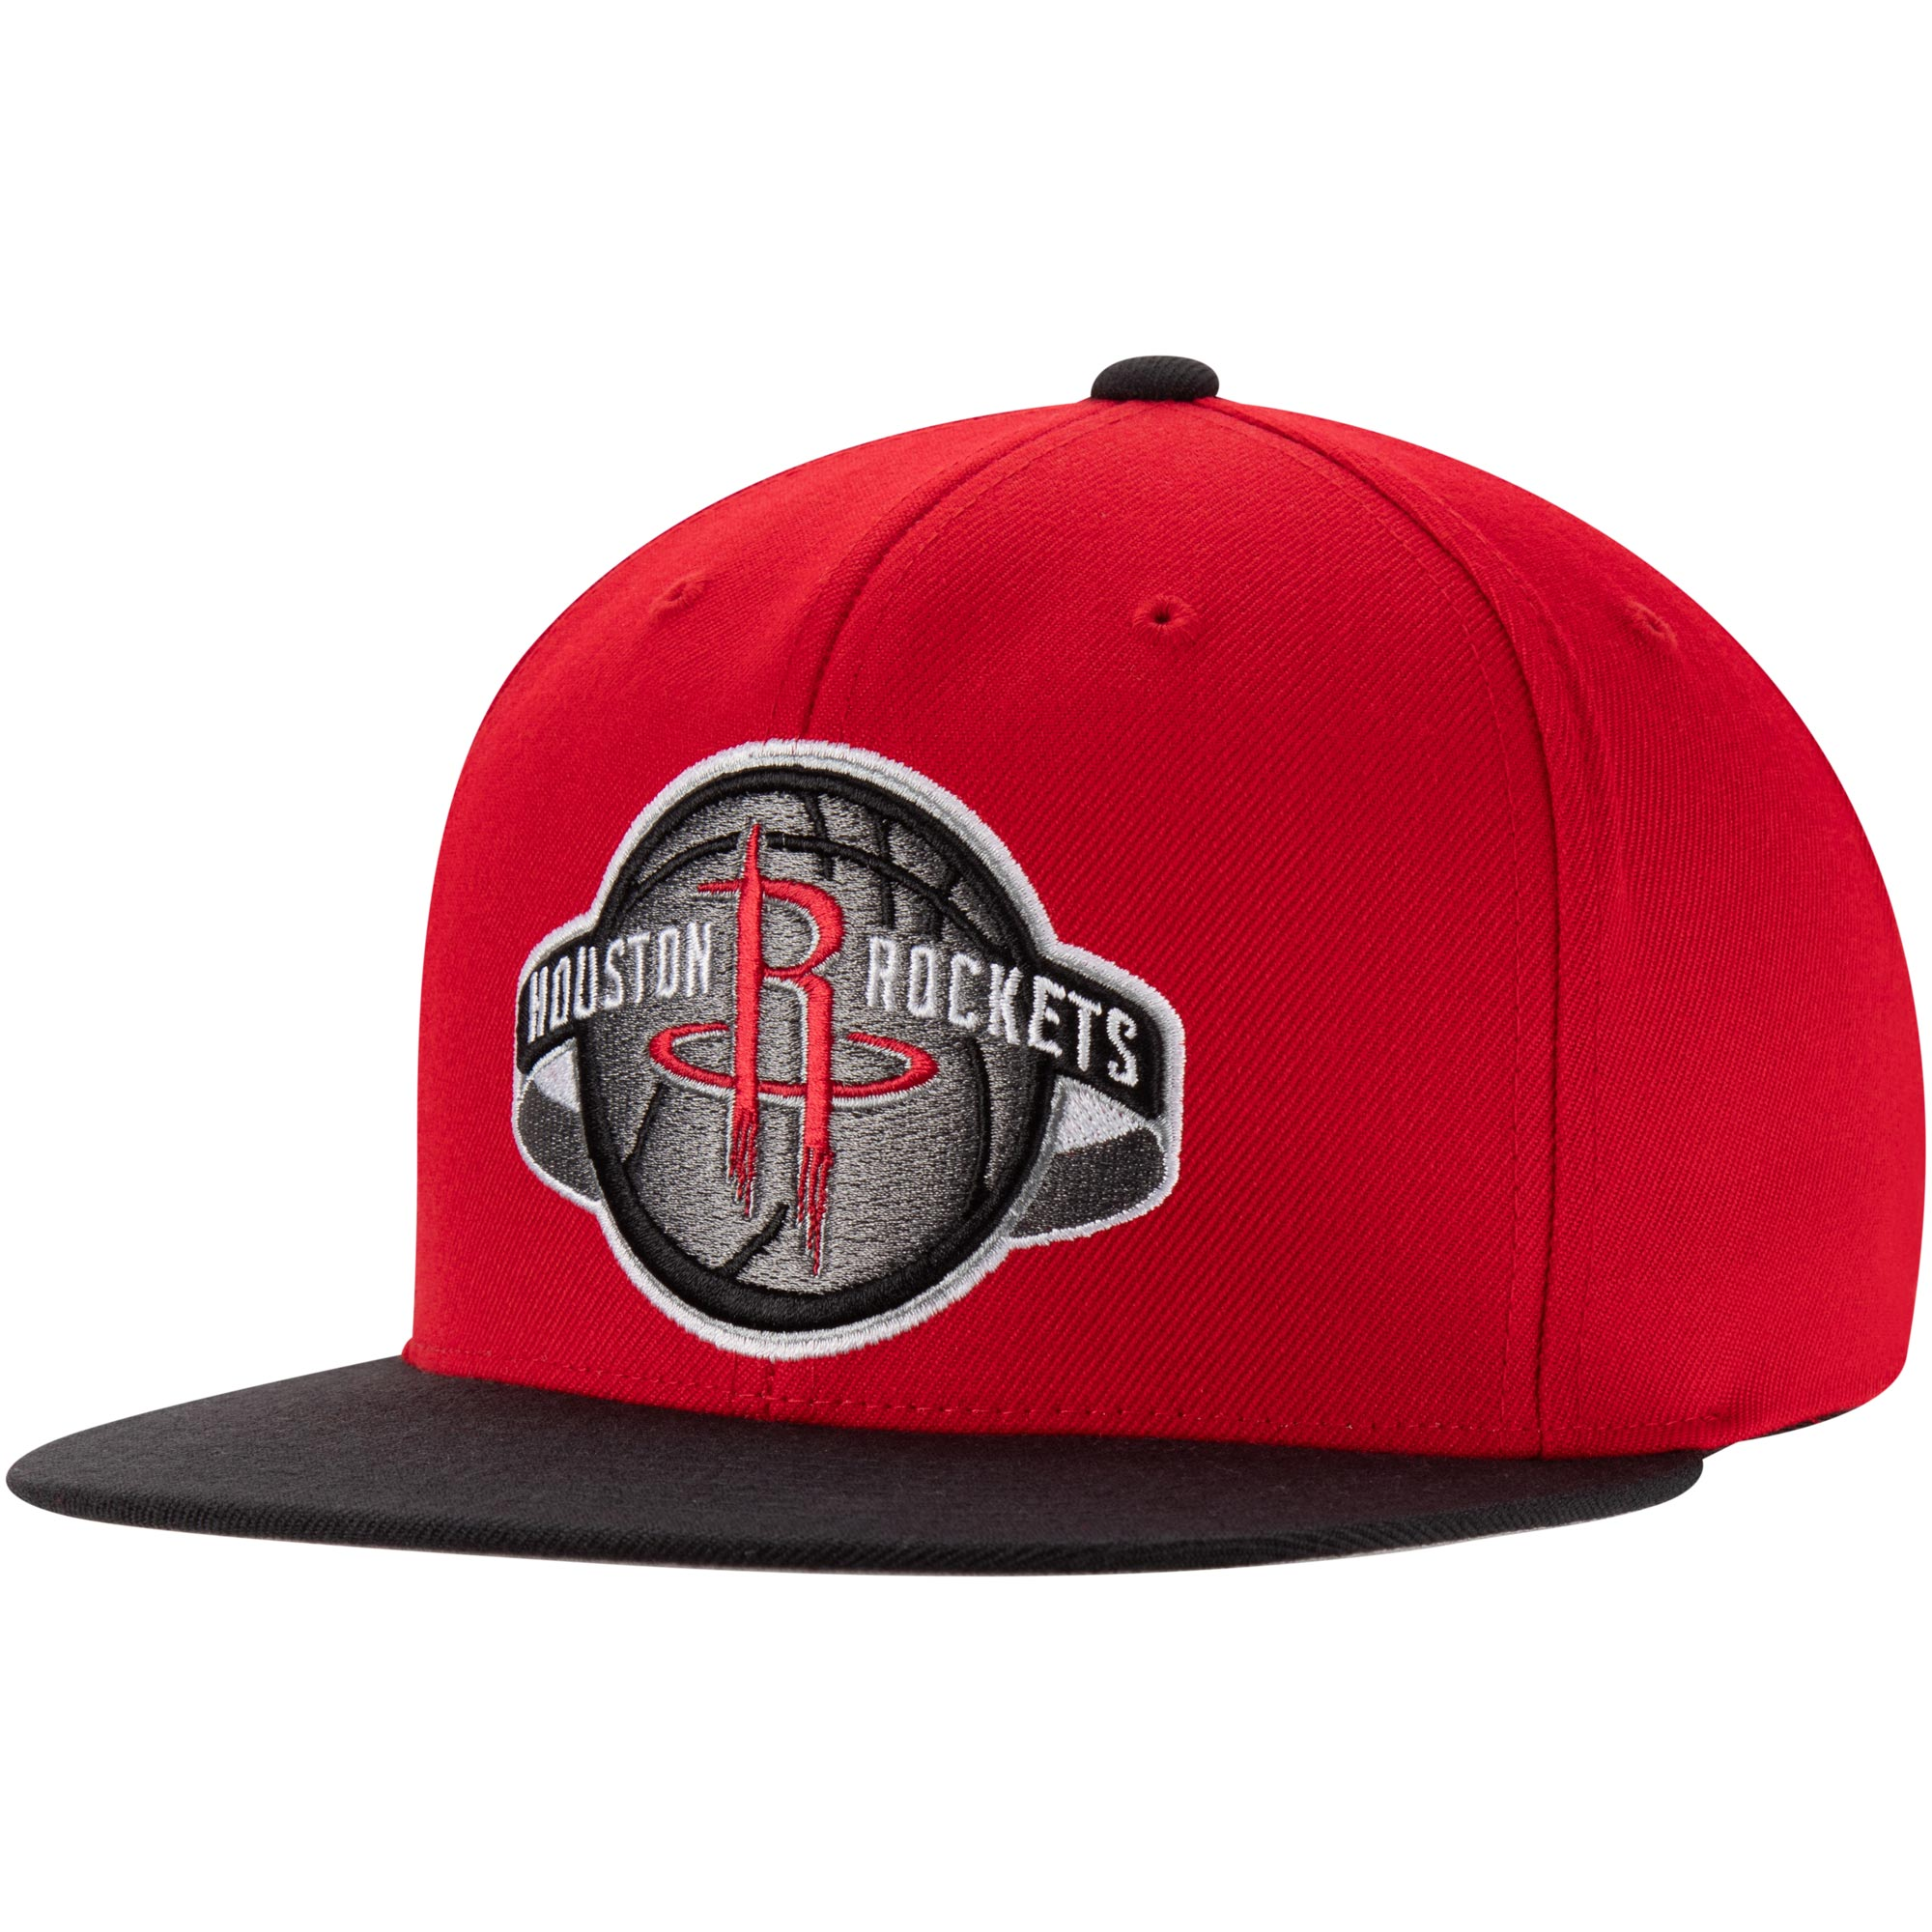 Houston Rockets Mitchell & Ness Two-Tone Wool Snapback Hat - Red/Black